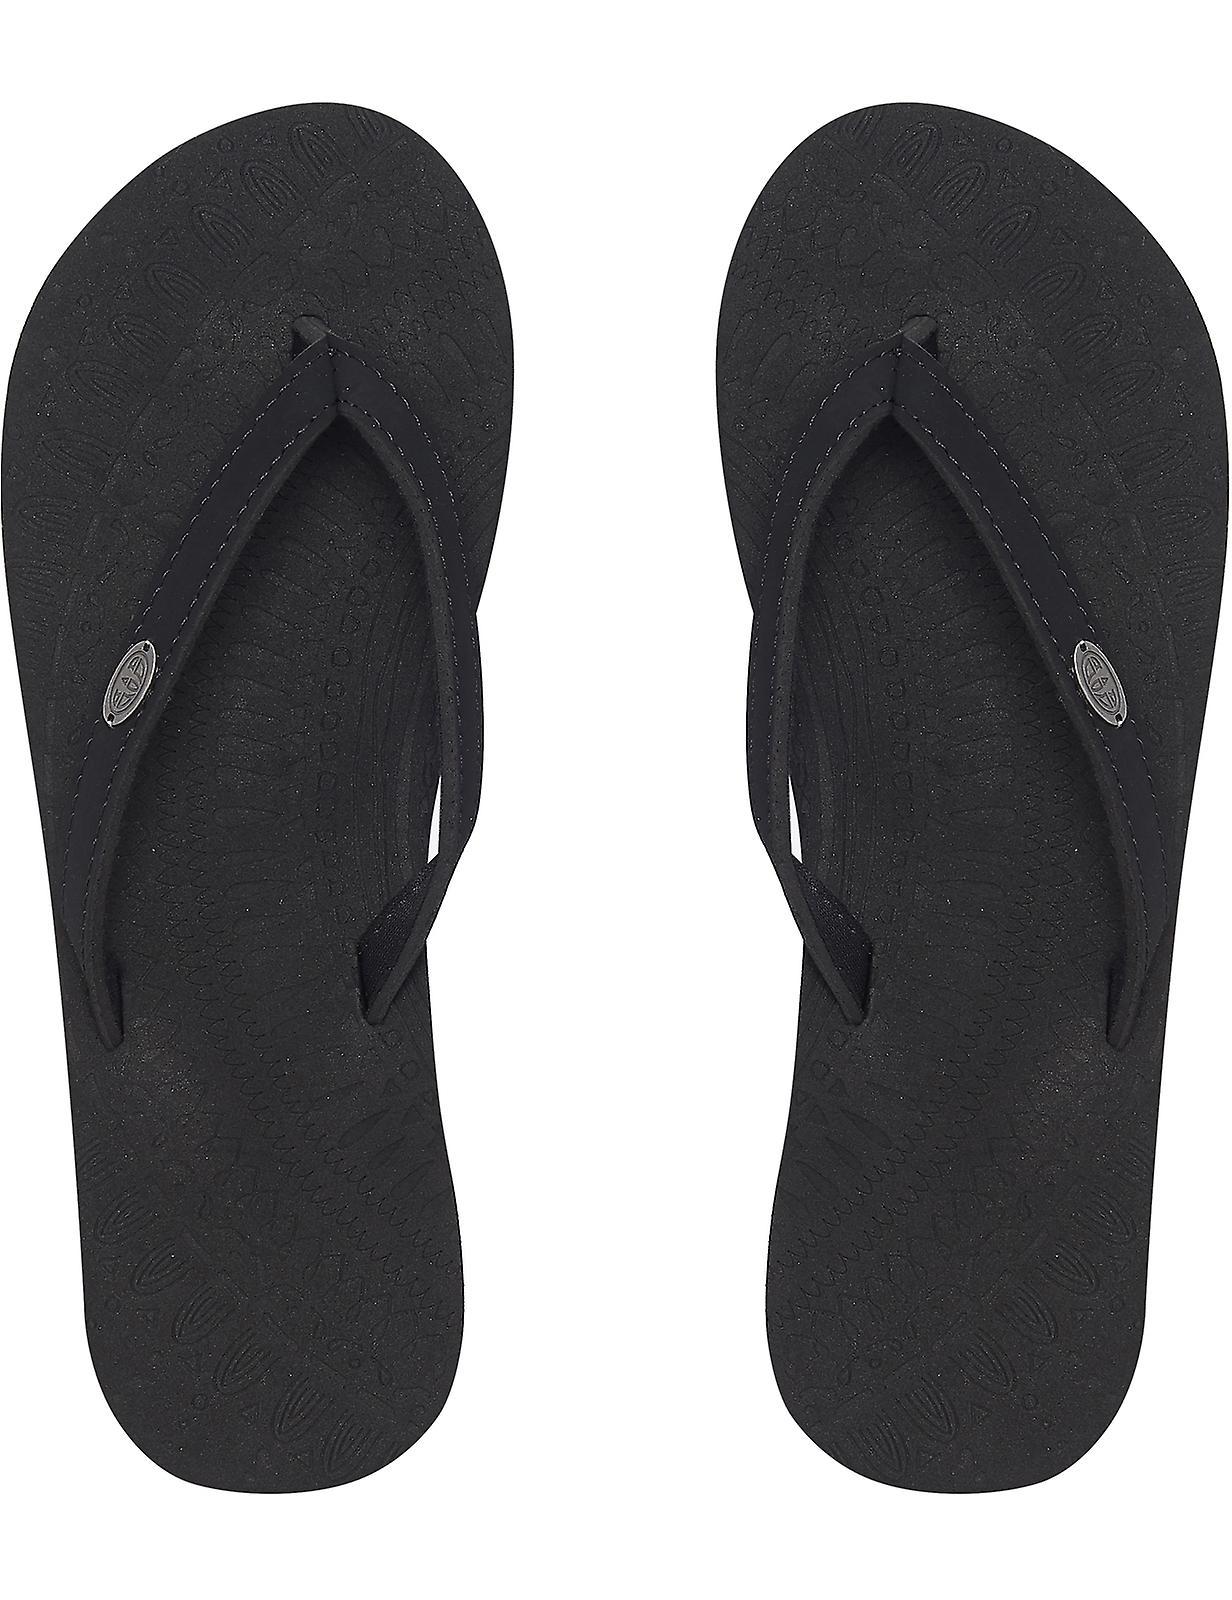 Animal Sorella Flip Flops in Black 5KKpz